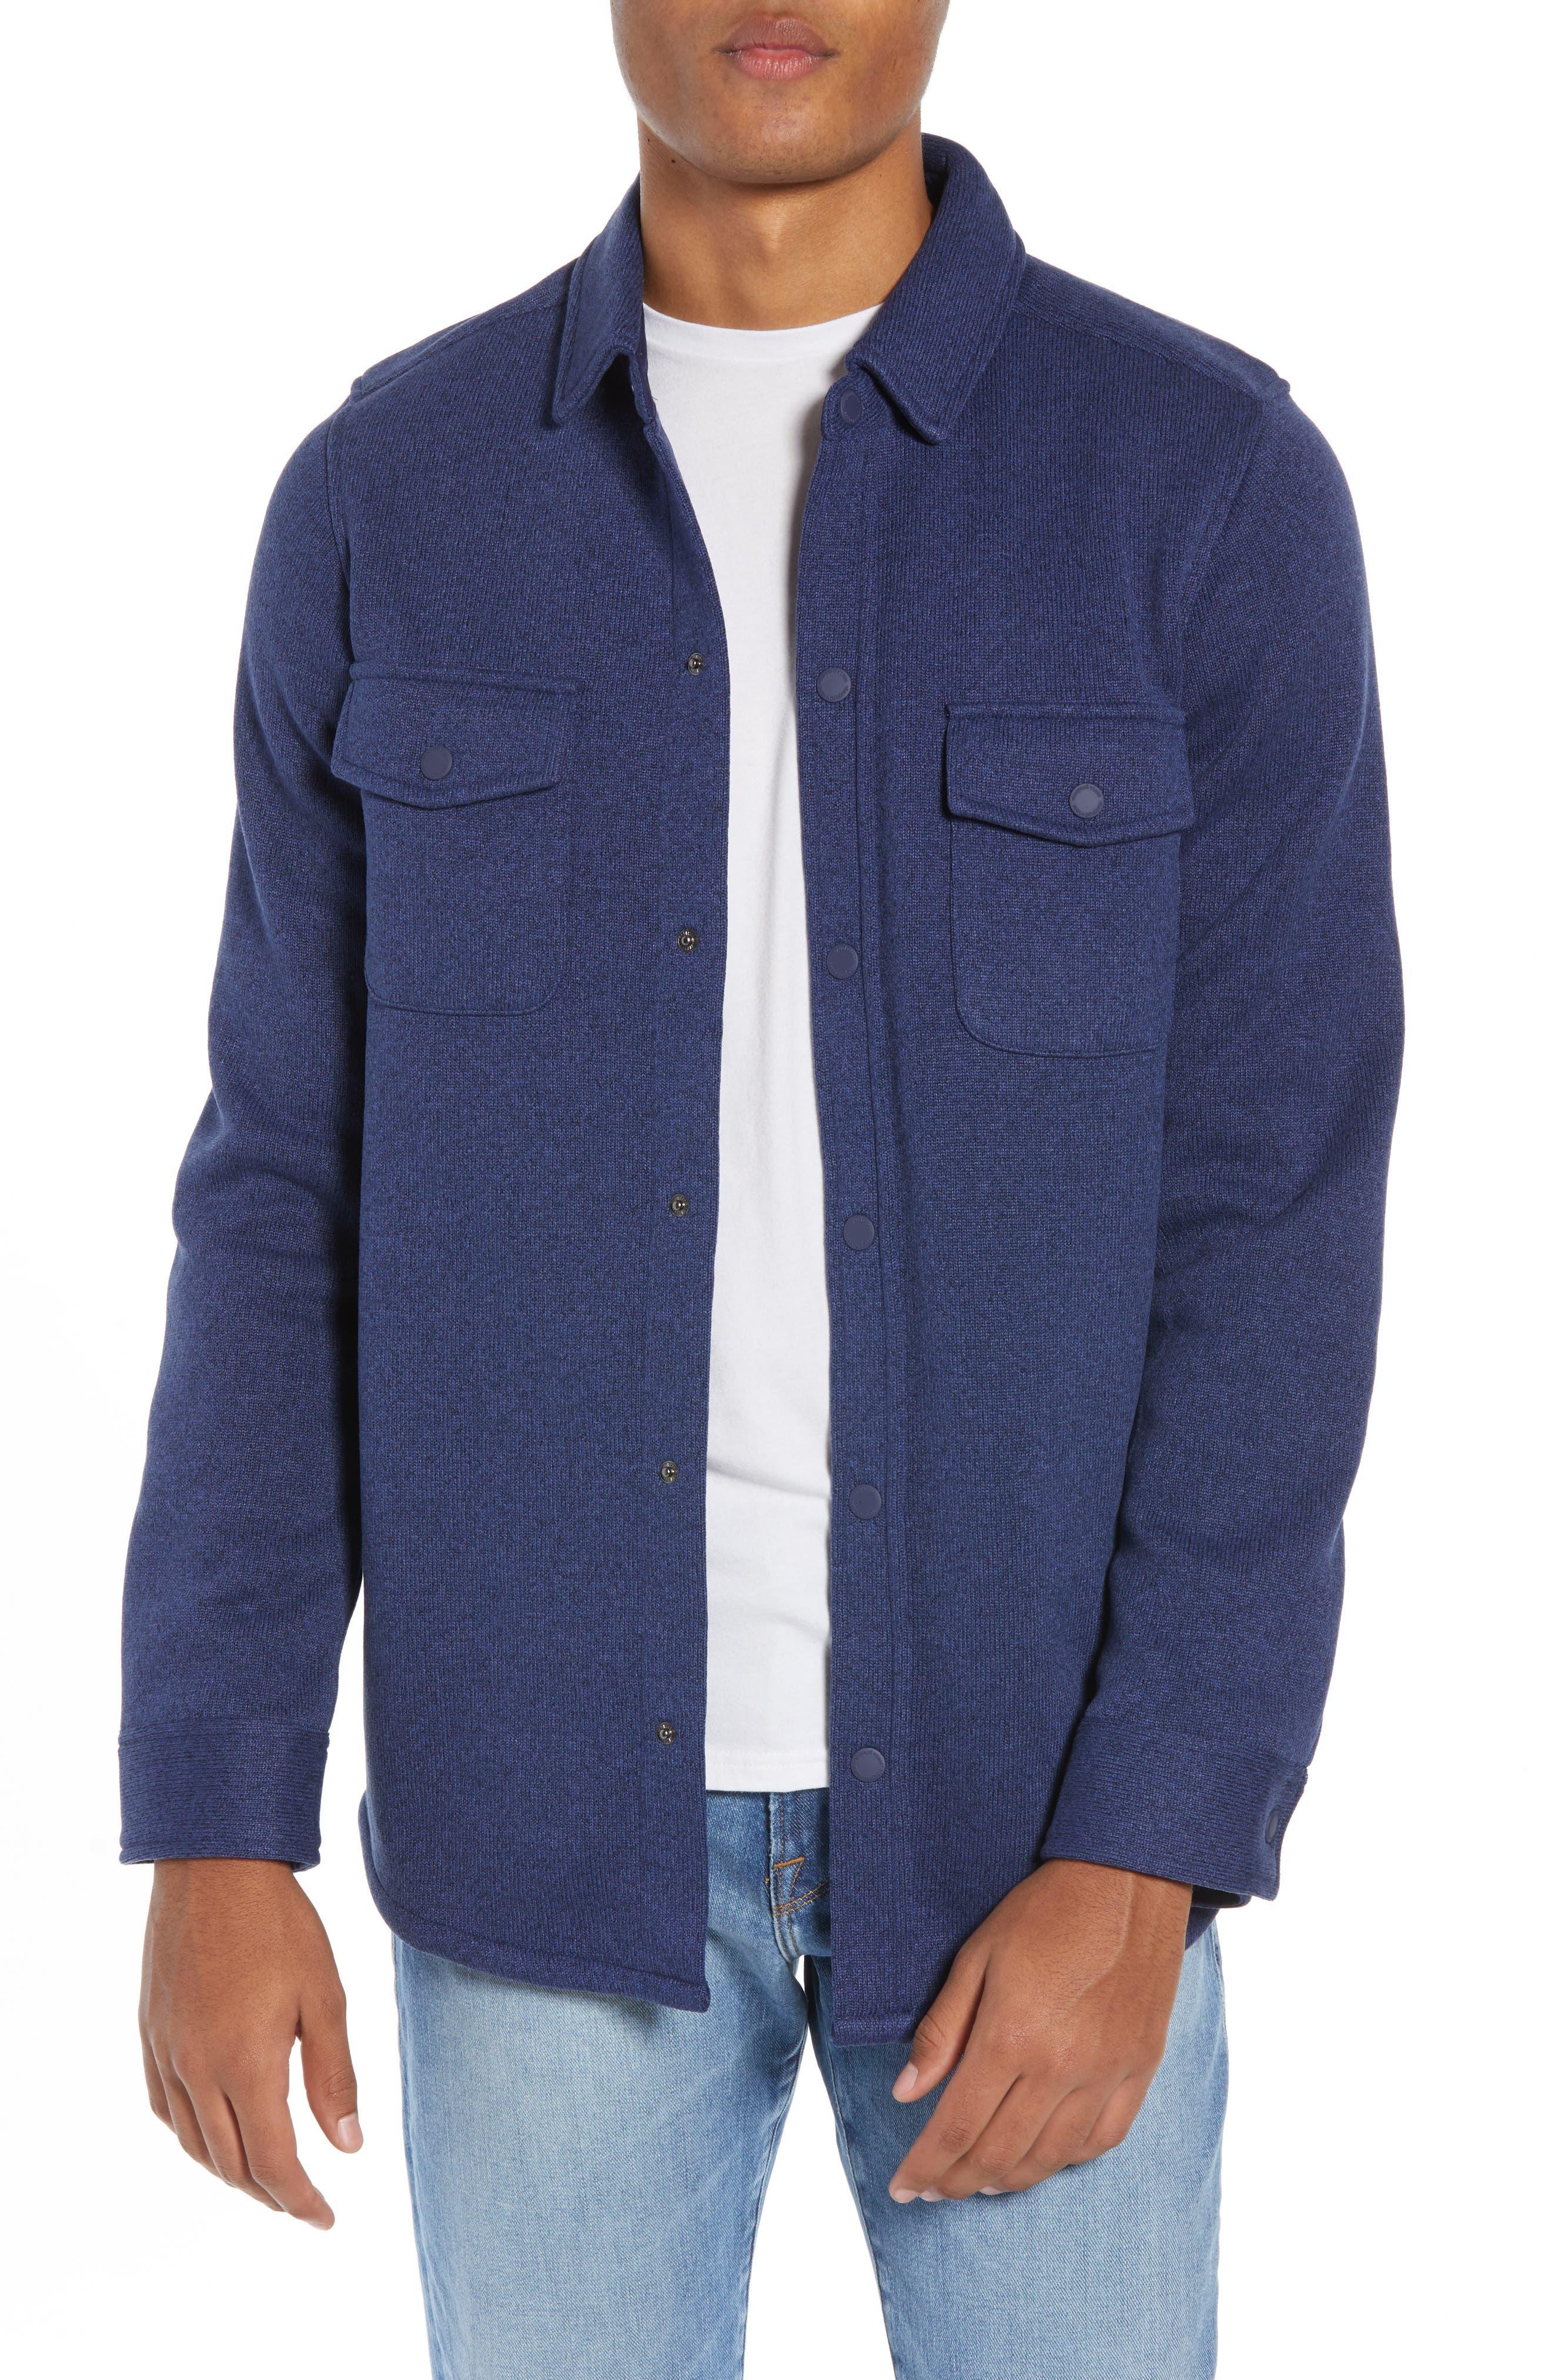 VINEYARD VINES Knit Regular Fit Shirt Jacket in Deep Bay